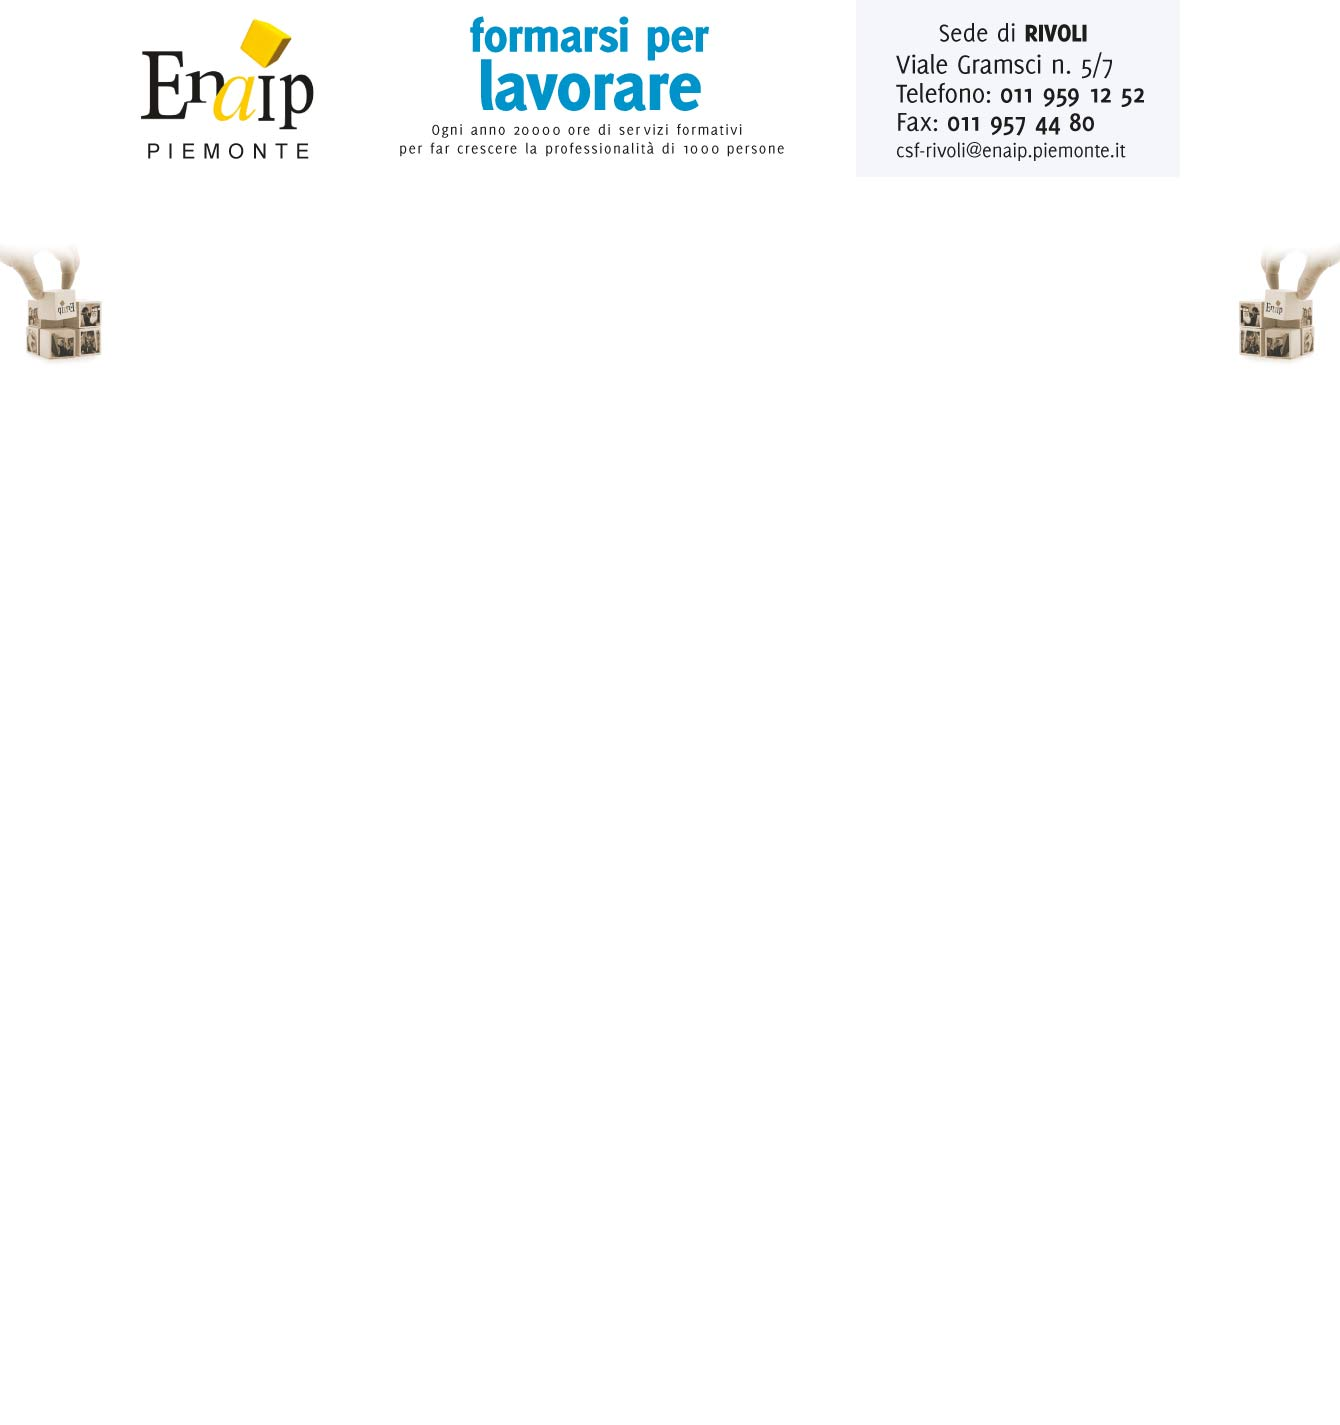 ENAIP